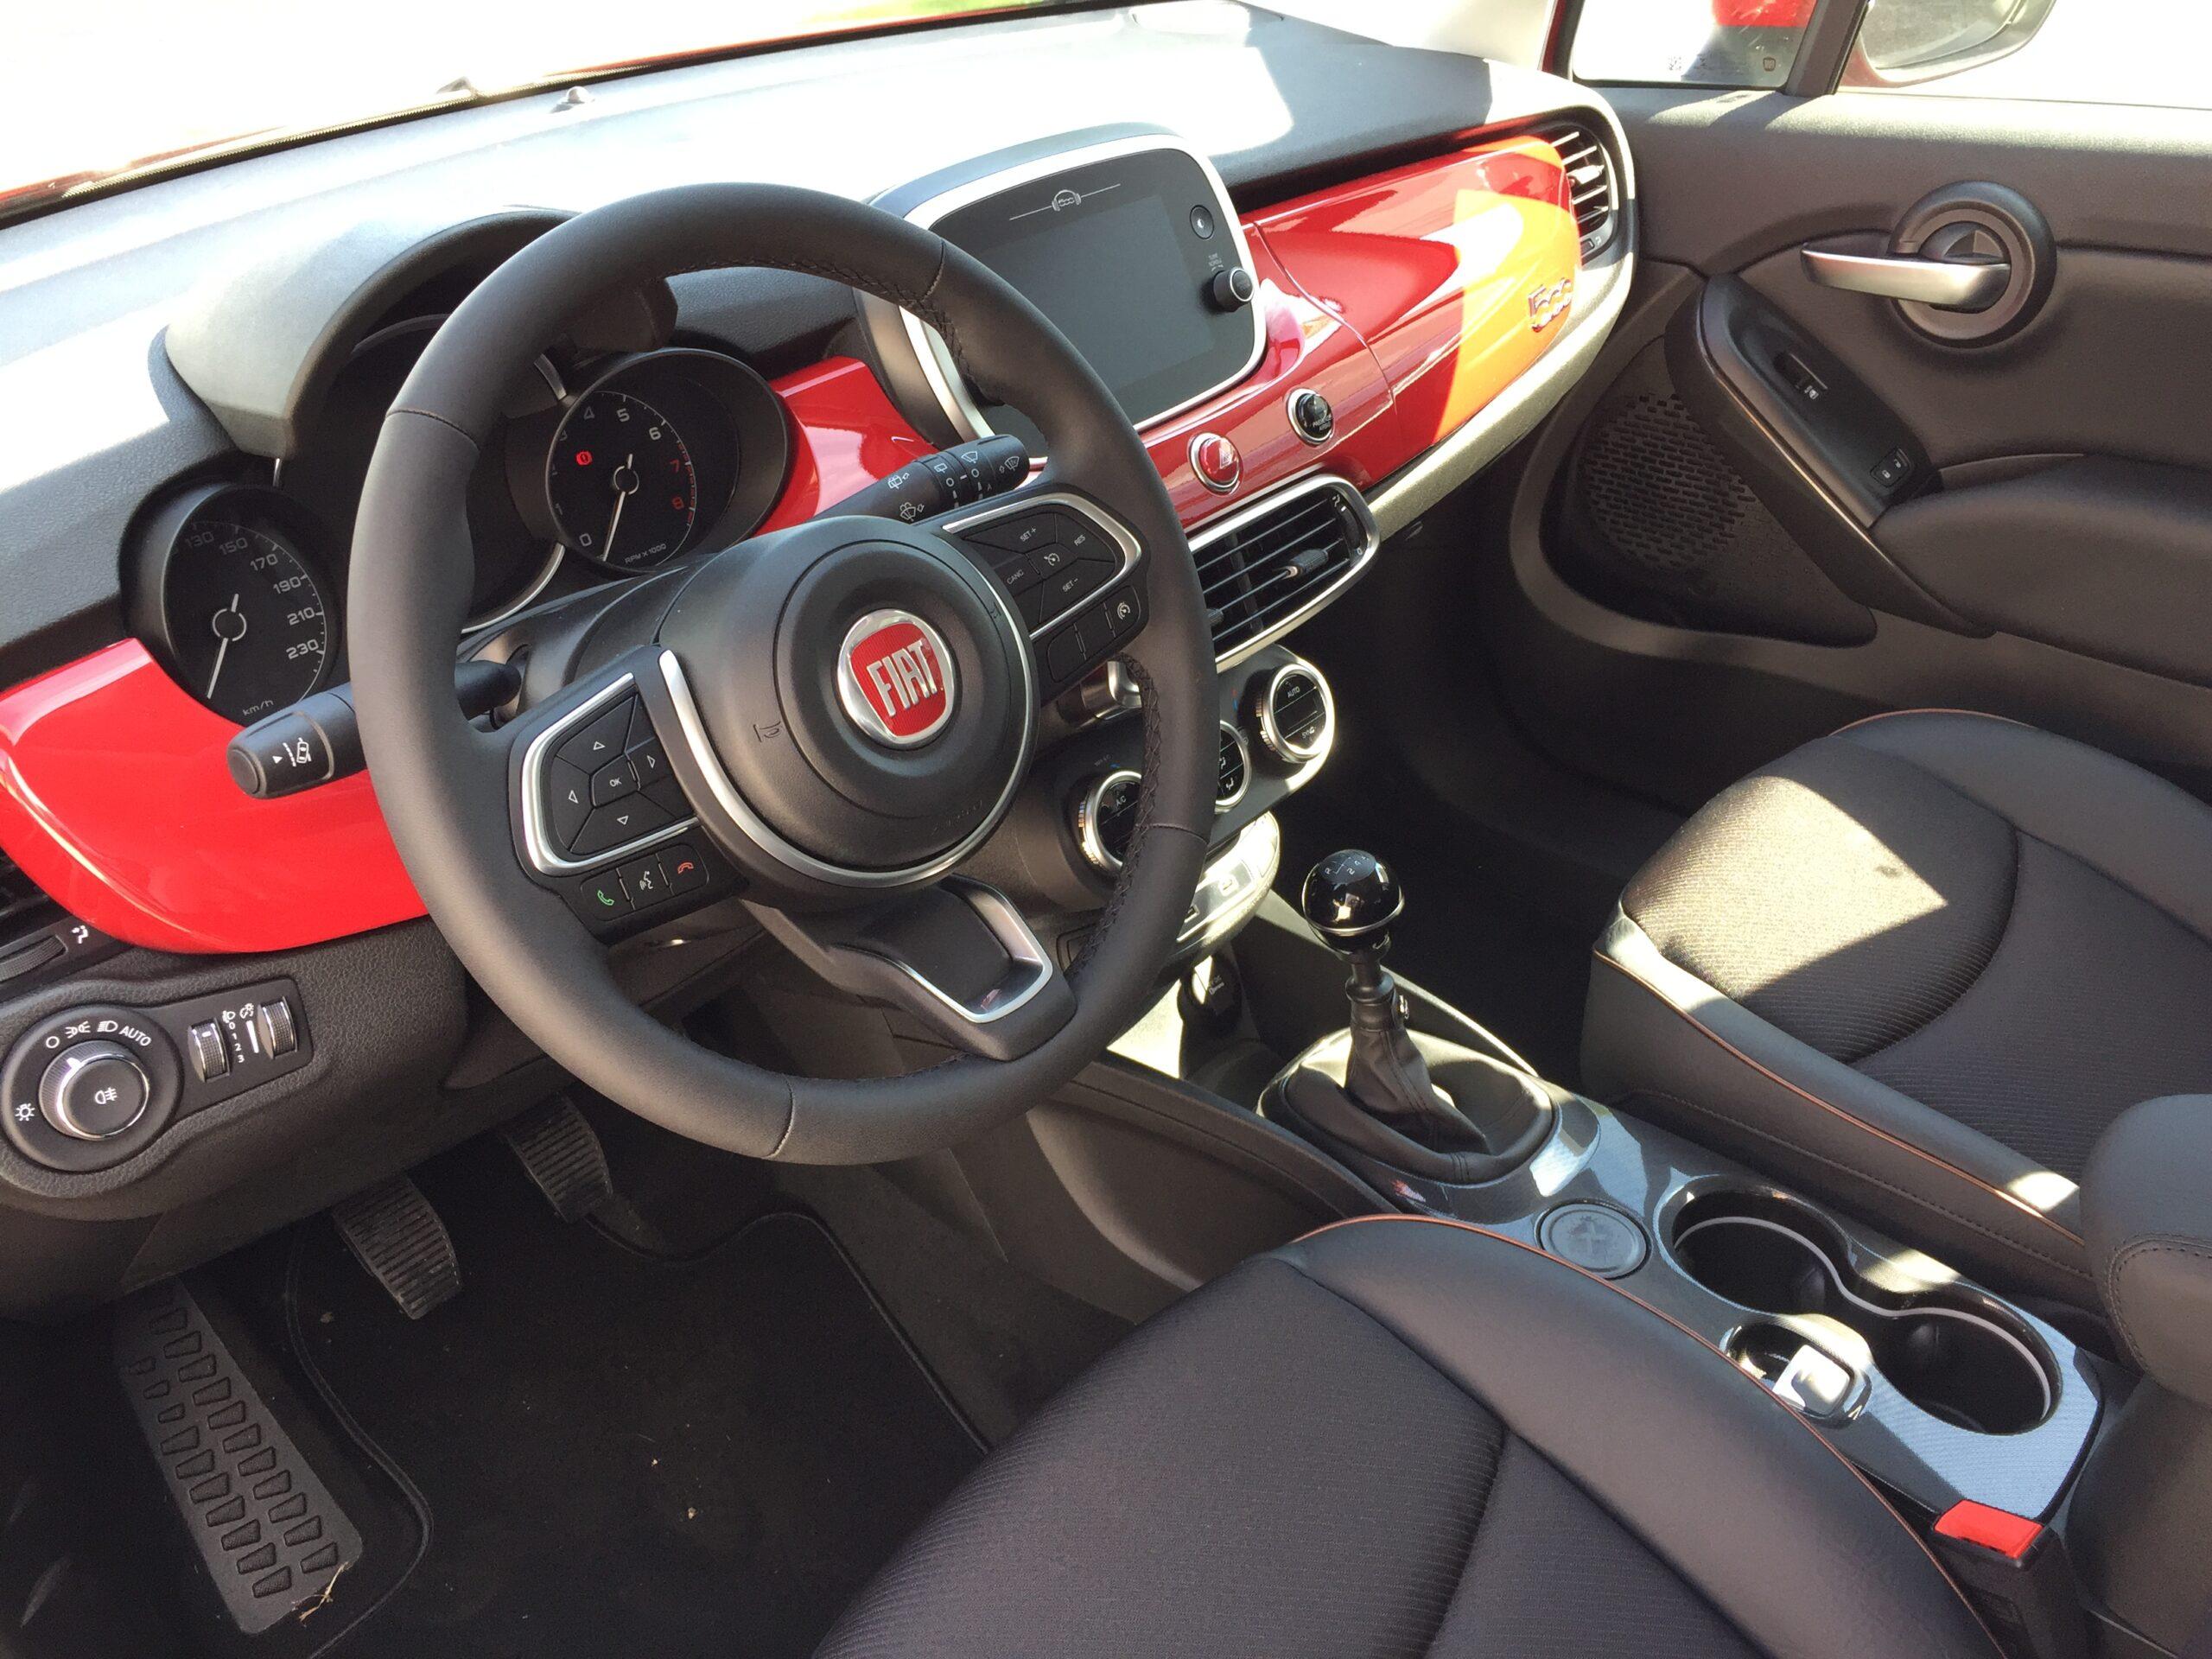 Fiat 500X Urban FireFly Turbo 120 Lounge, NEUWAGEN full